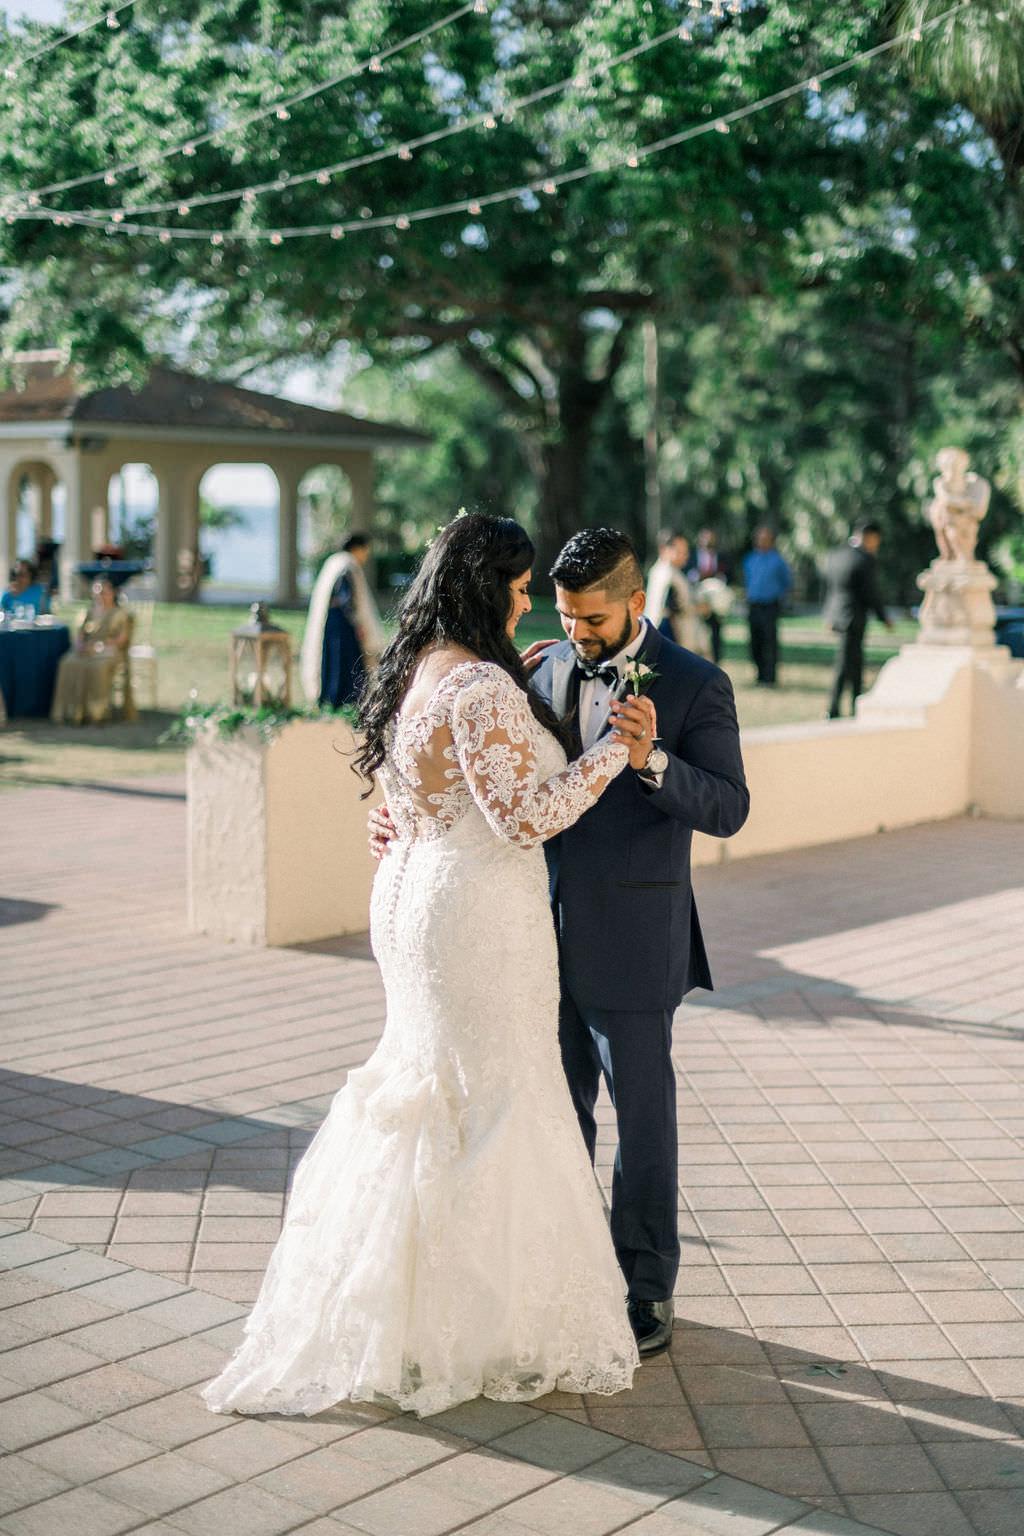 Indian Florida Bride and Groom First Dance at Outdoor Reception, Powel Crosley Estate in Sarasota